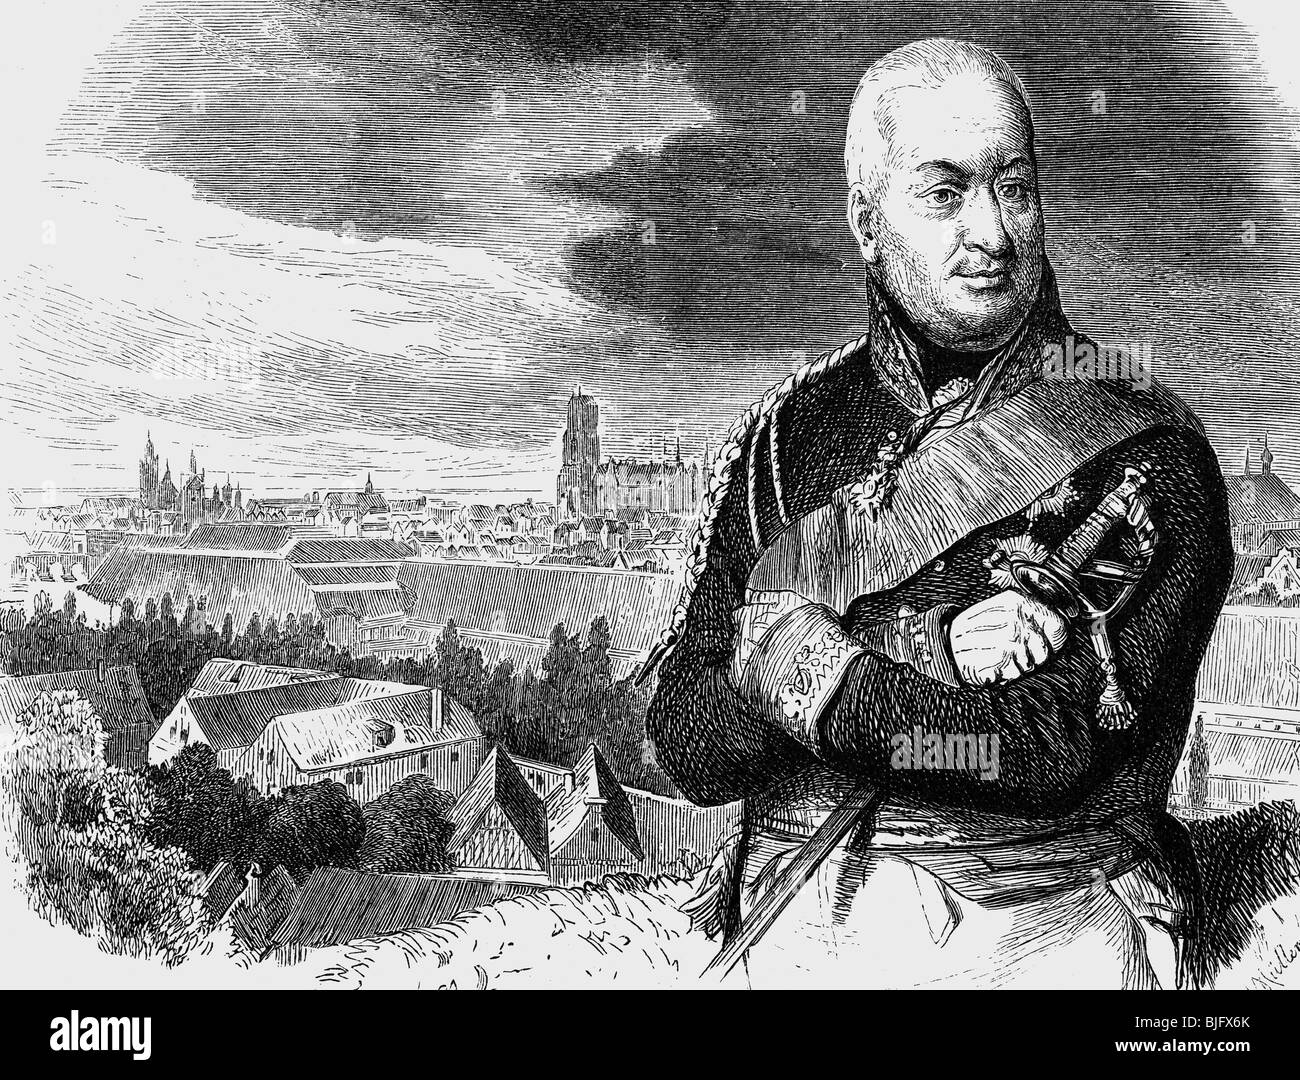 Kalckreuth, Friedrich Adolf von, 22.2.1737 - 10.6.1818, Prussian general, in Danzig, 1807, wood engraving, 19th - Stock Image